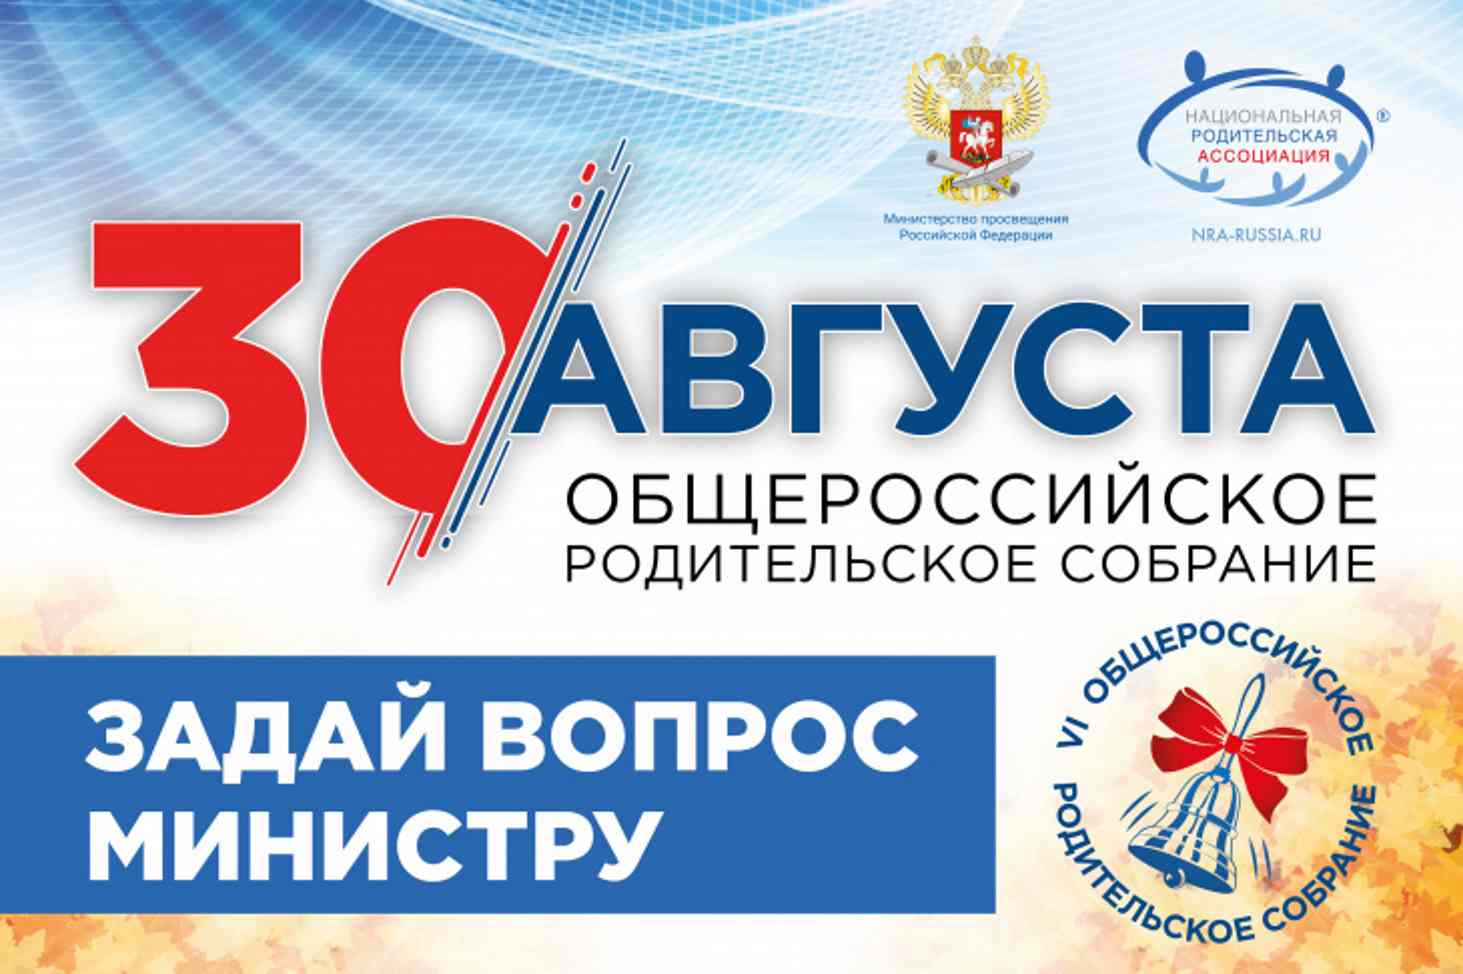 zadajte-vopros-ministru-prosveshheniya-olge-vasilevoj-do-20-avgusta